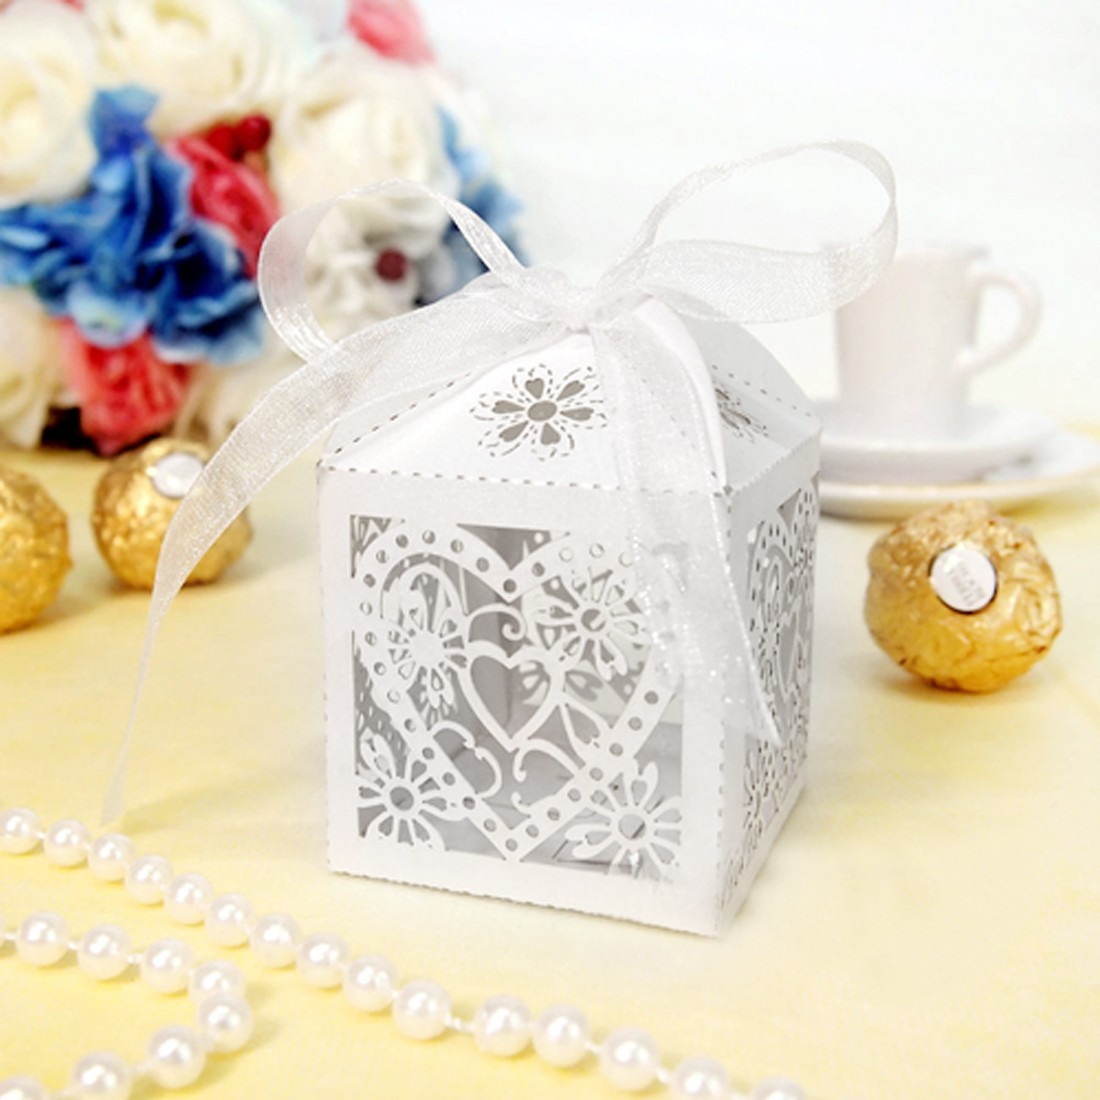 Low sale 10pcs/Set Love Heart Party Wedding Hollow Candy Boxes ...